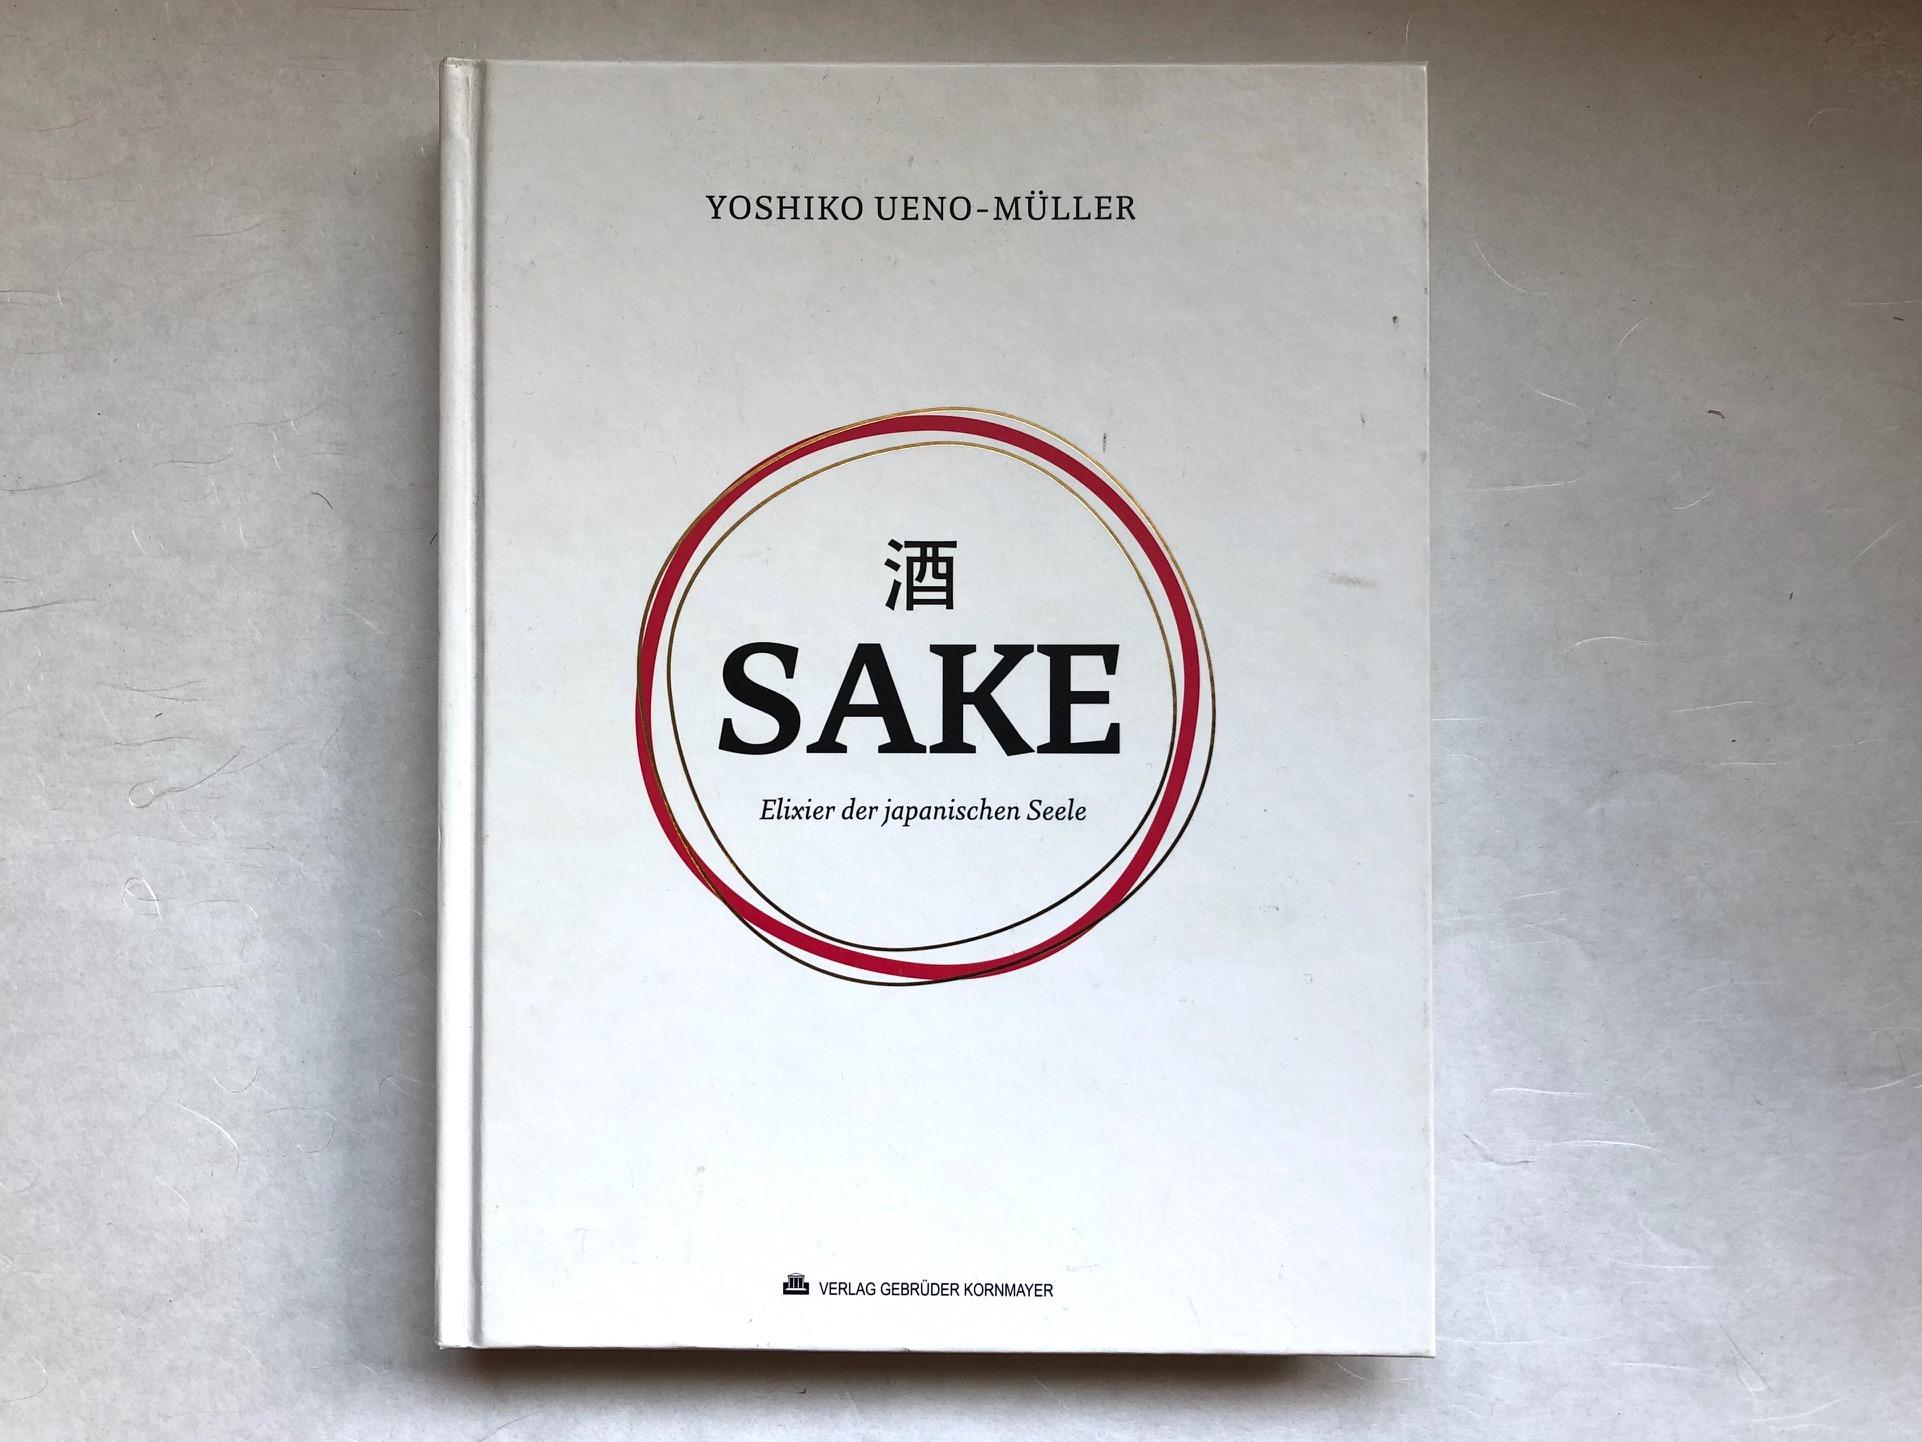 Sake (Yoshiko Ueno-Müller)